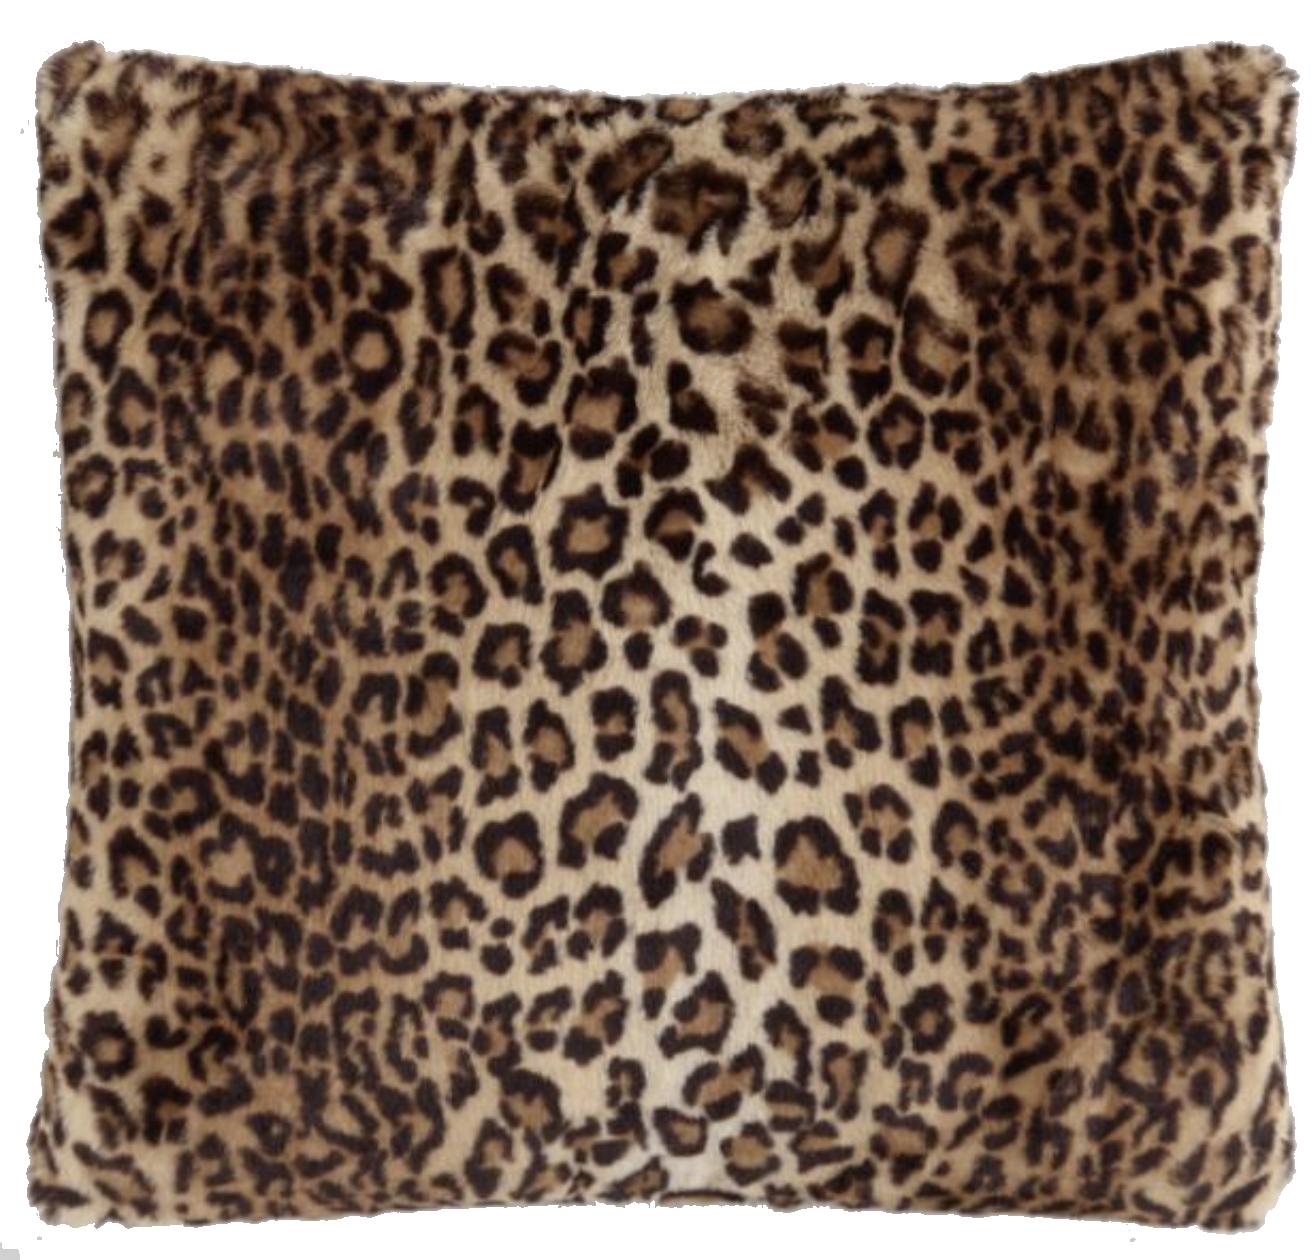 Leopard Print Pillow.png